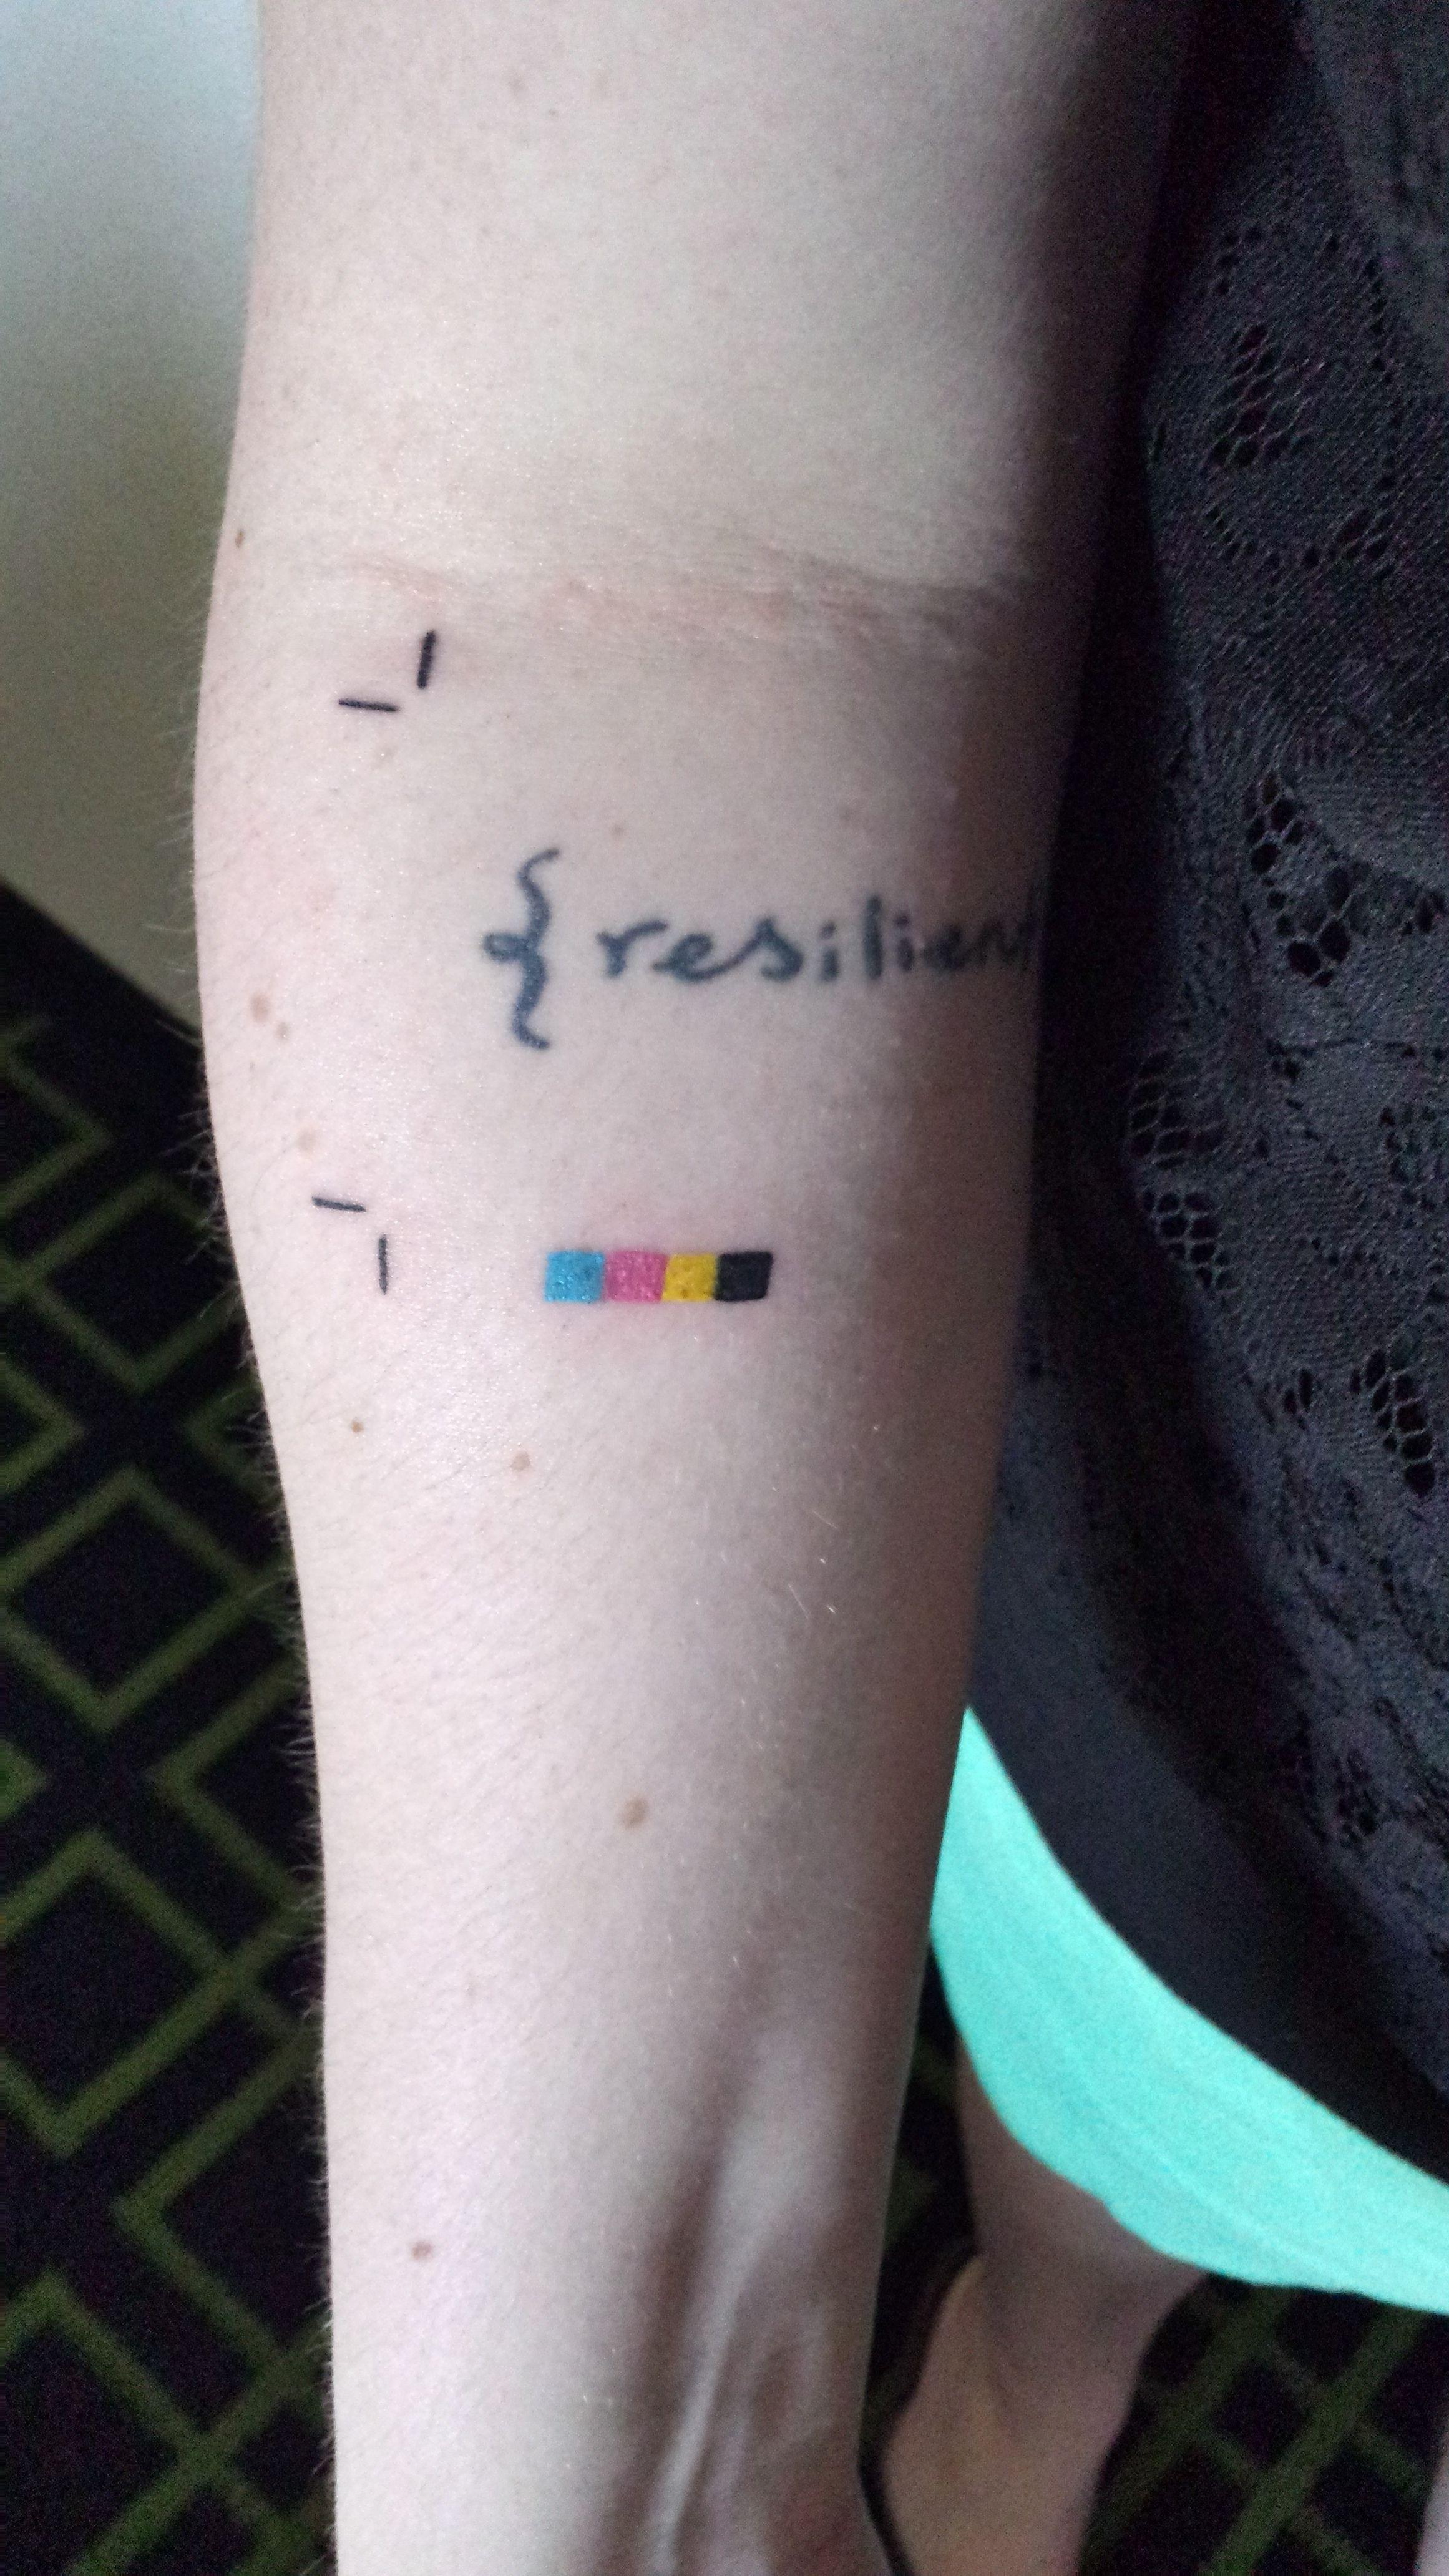 Cmyk Tattoo Graphicdesign Design Graphic Design Tattoos Tattoos Graphic Design Humor